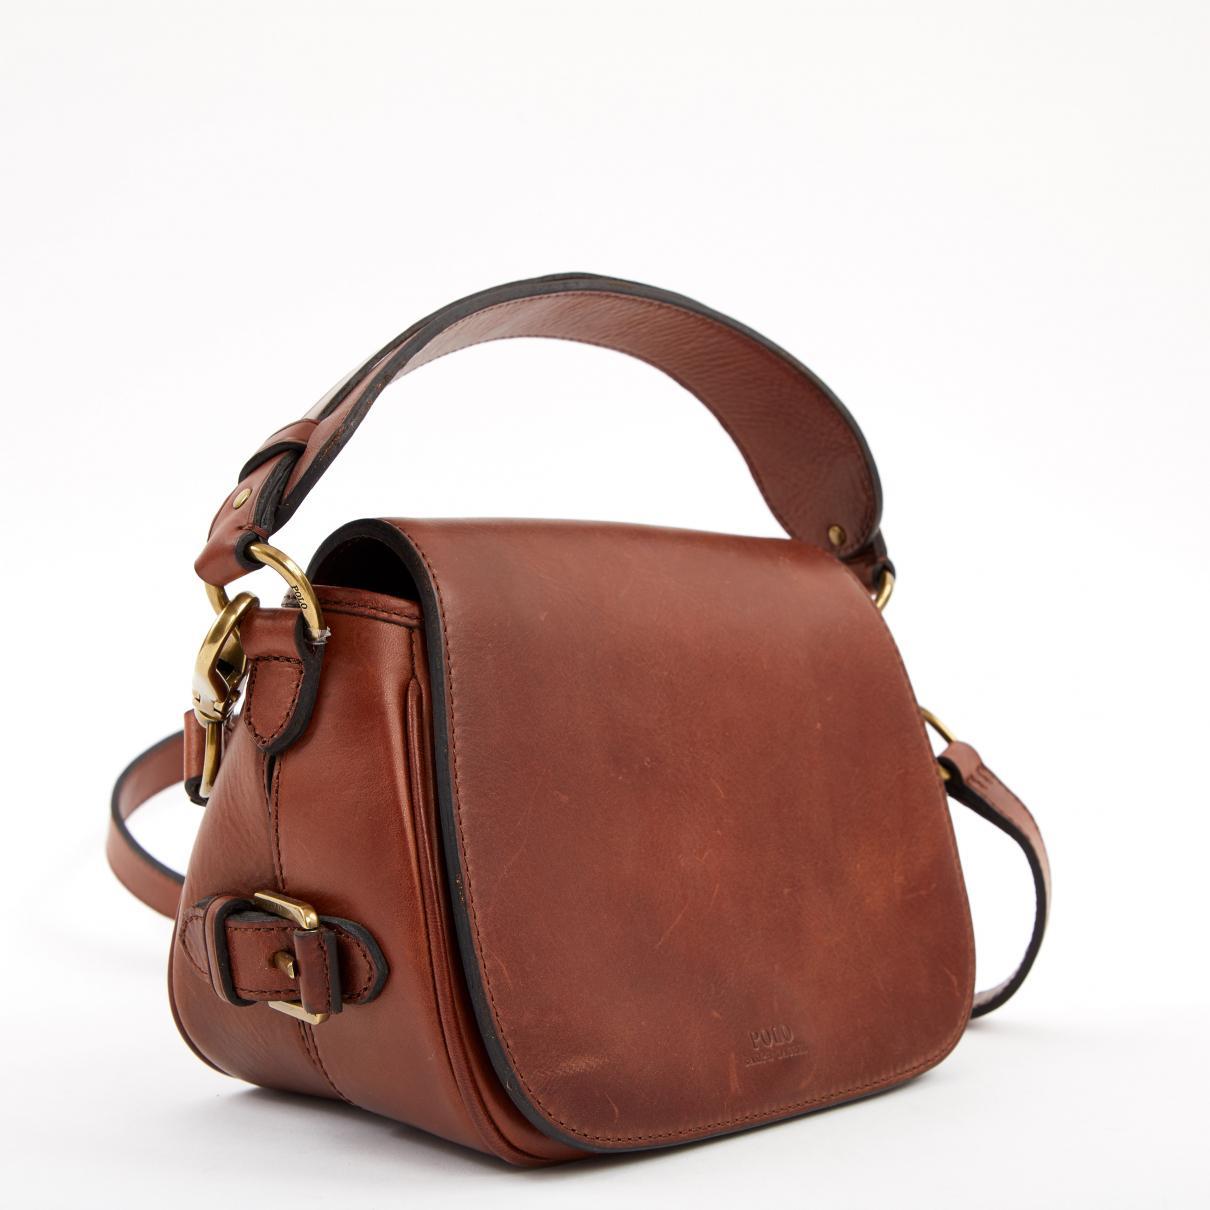 43b74e16ee Polo Ralph Lauren - Brown Leather Handbag - Lyst. View fullscreen